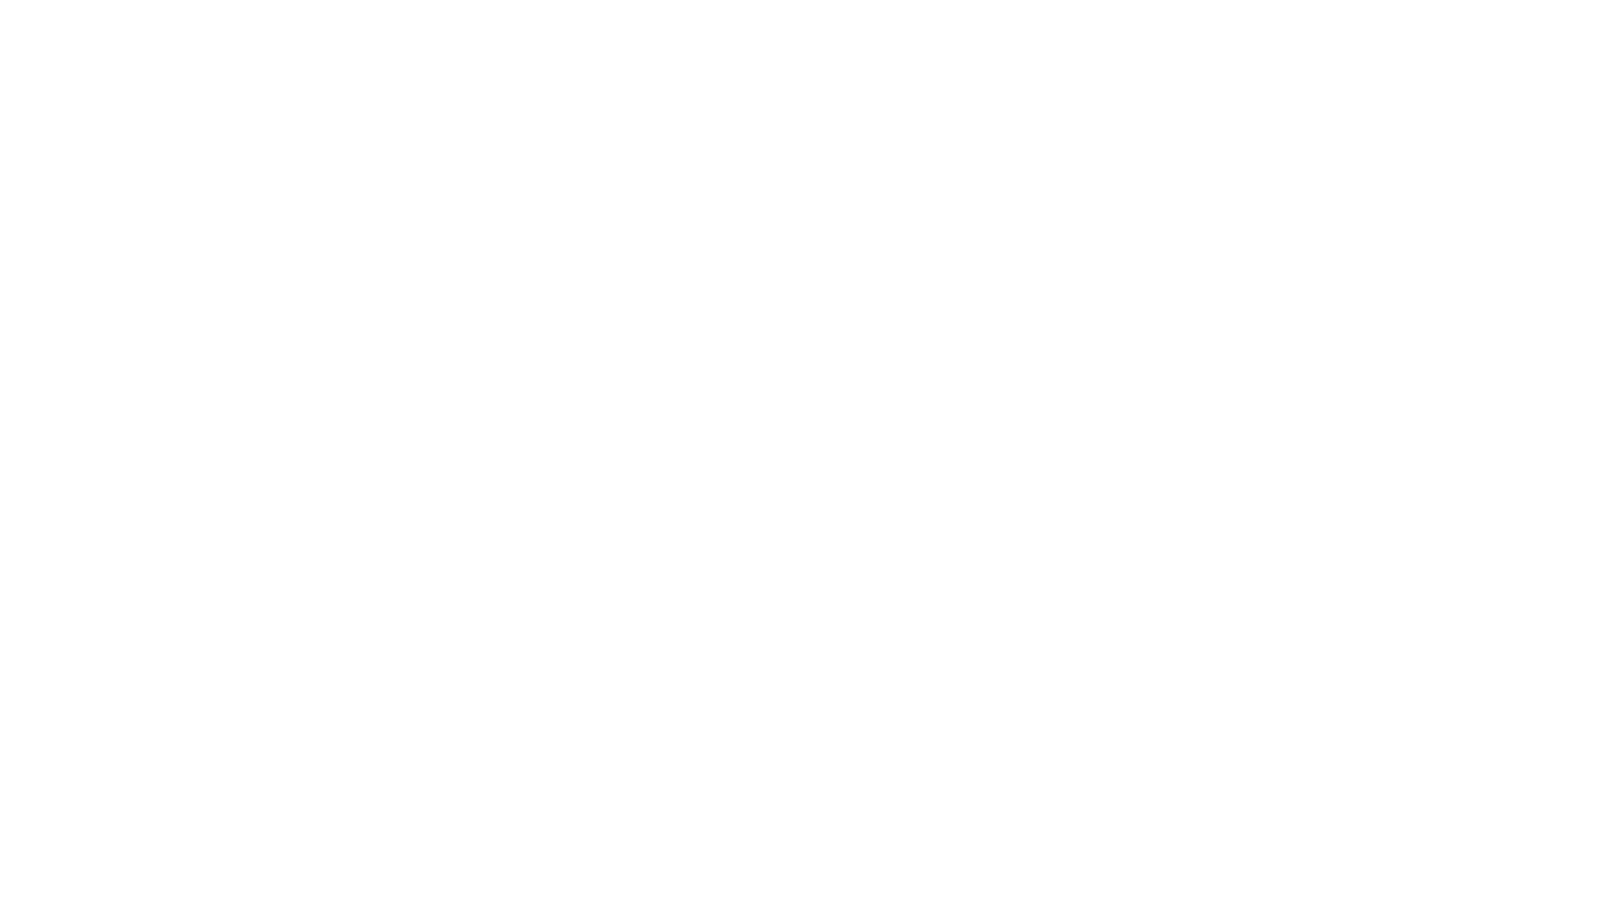 Bagaimana kesan Ibu Silva, pemilik hunian di blok A7 Dandelion Garden Sukabumi?  Simak videonya sampai selesai ya...  Info lebih lengkap, hubungi admin dengan klik link berikut : wa.me/62811803276  #huniankeren #rumah2lantaisukabumi #rumahkprsukabumi #hunianmodern #investasihunian